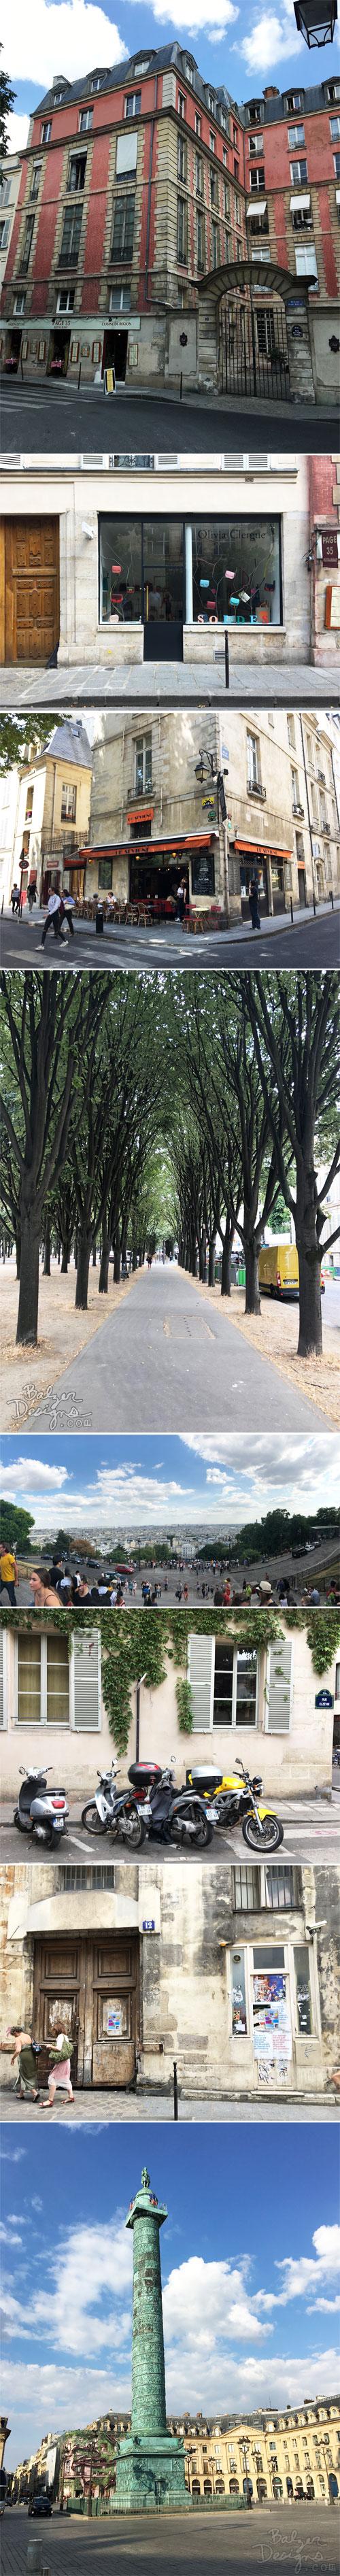 From the Balzer Designs Blog: Walking Paris